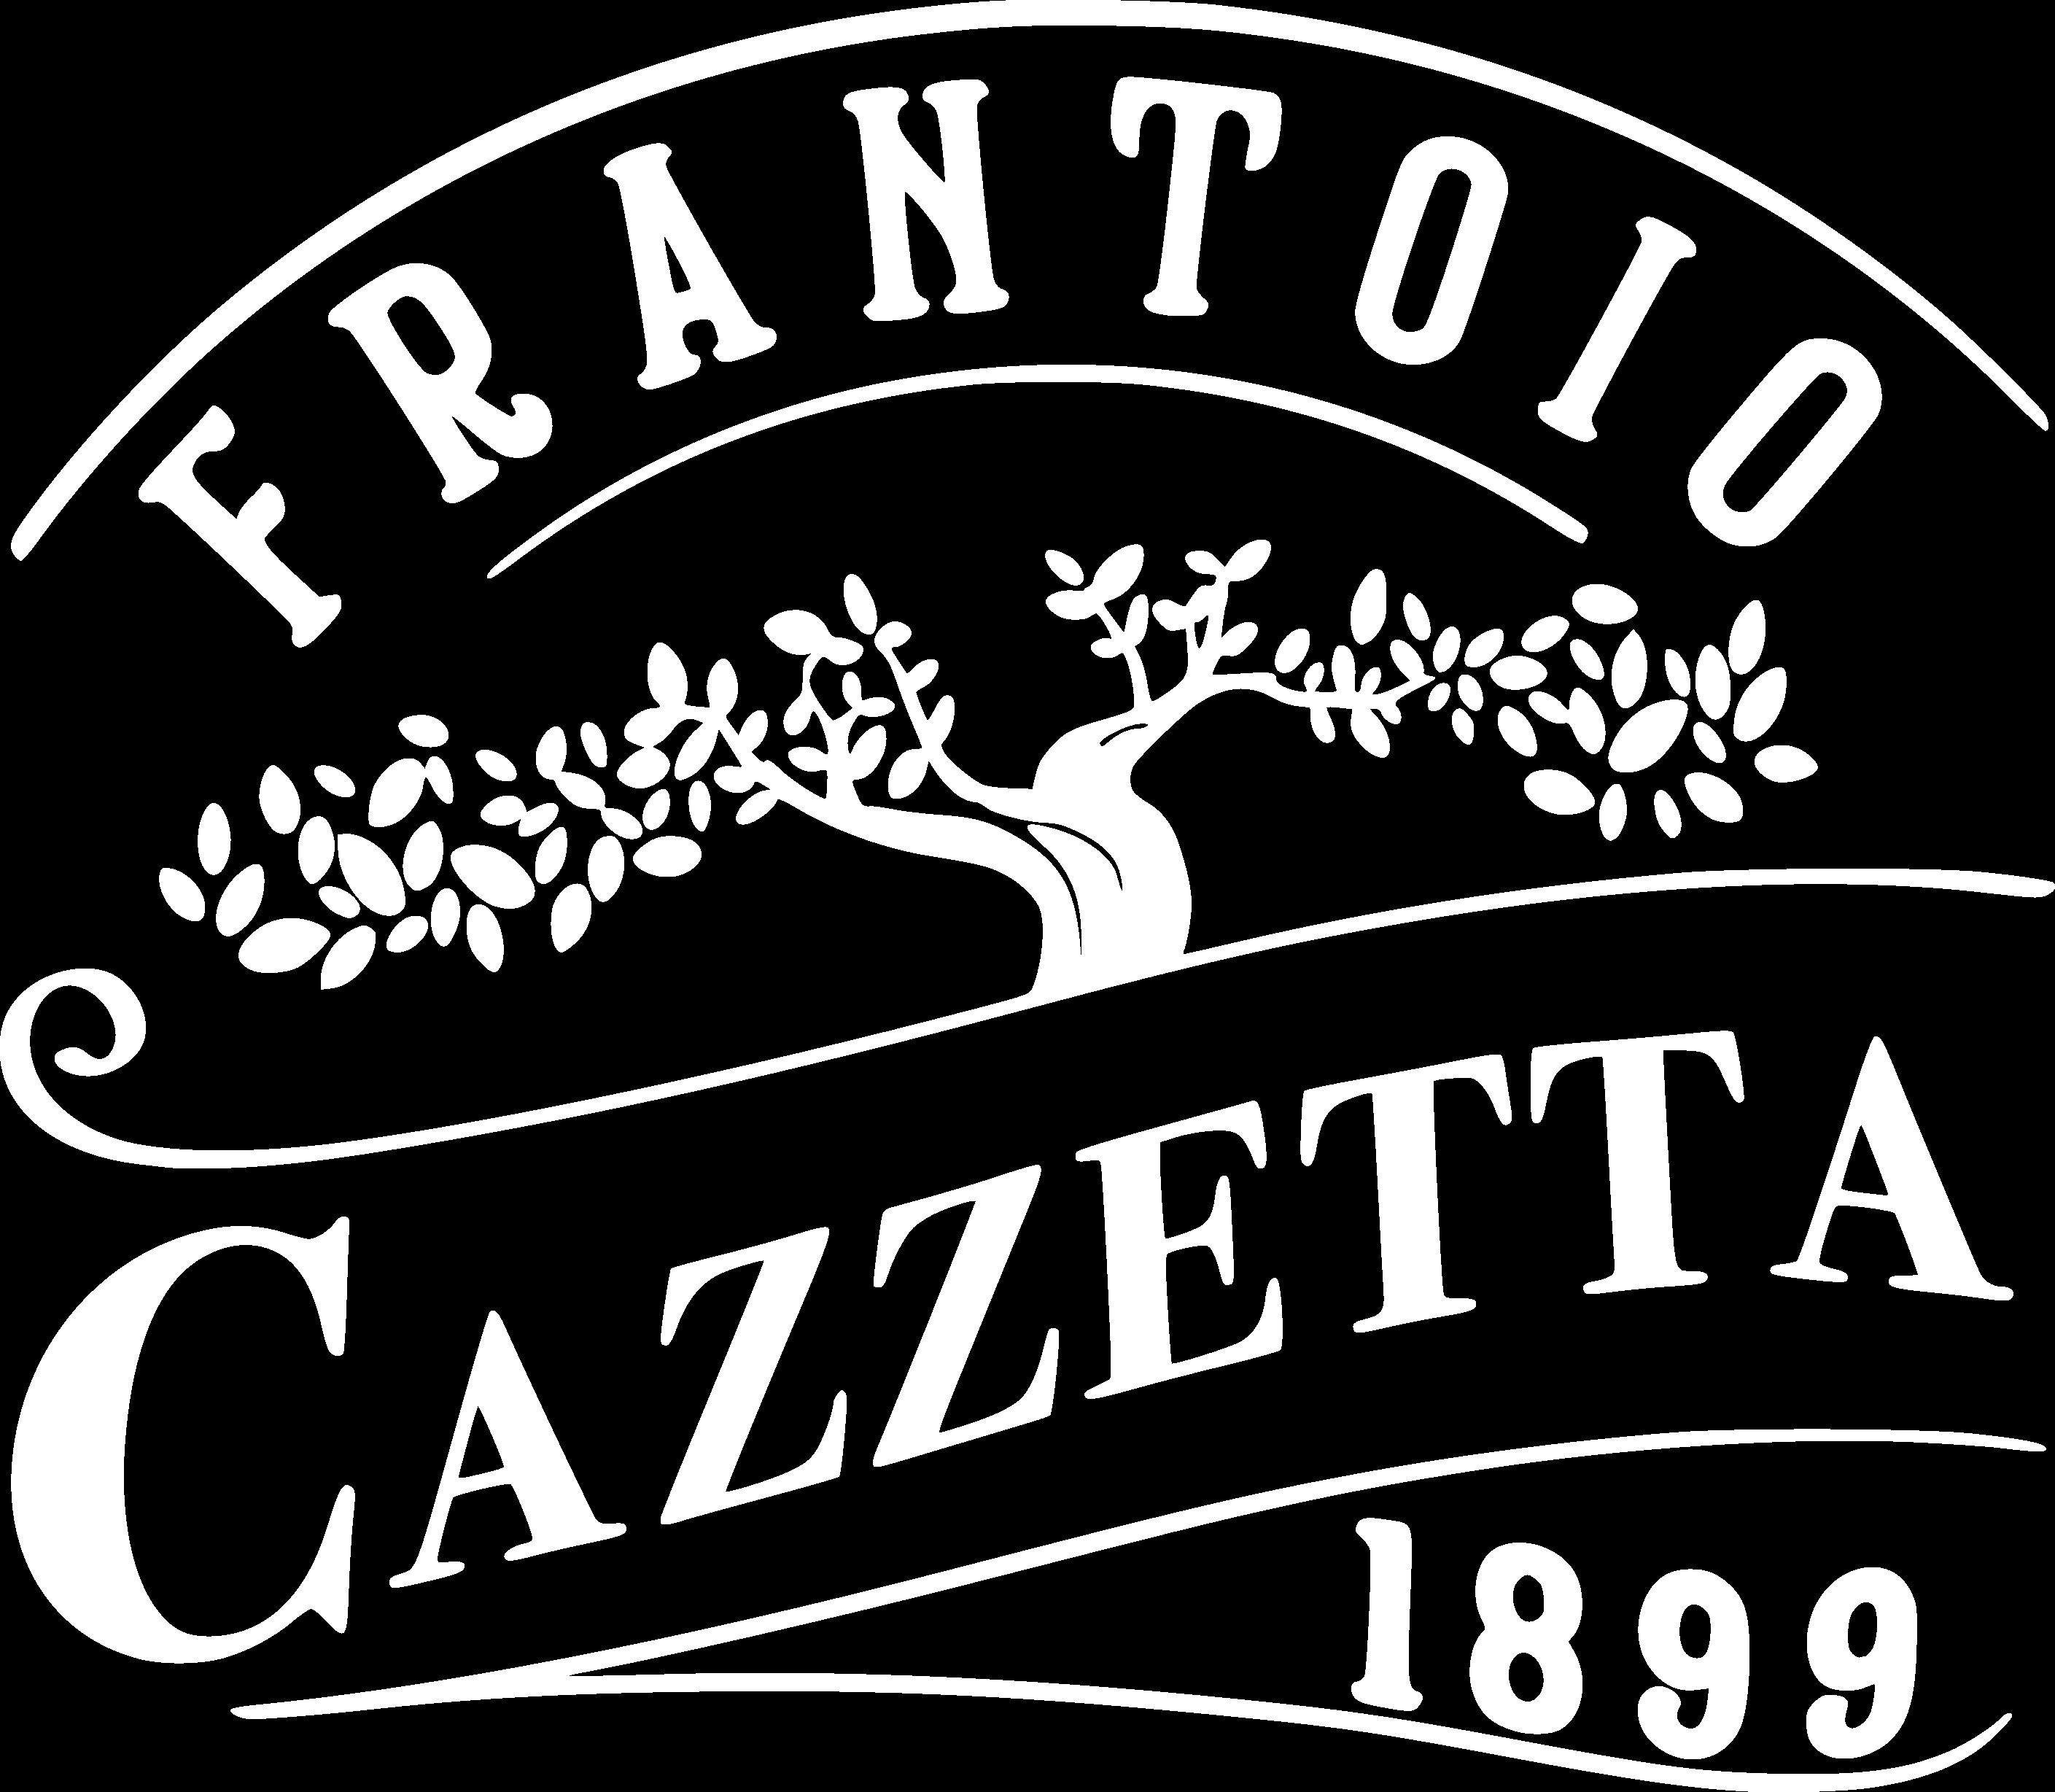 frantoio cazzetta logo 1899 white